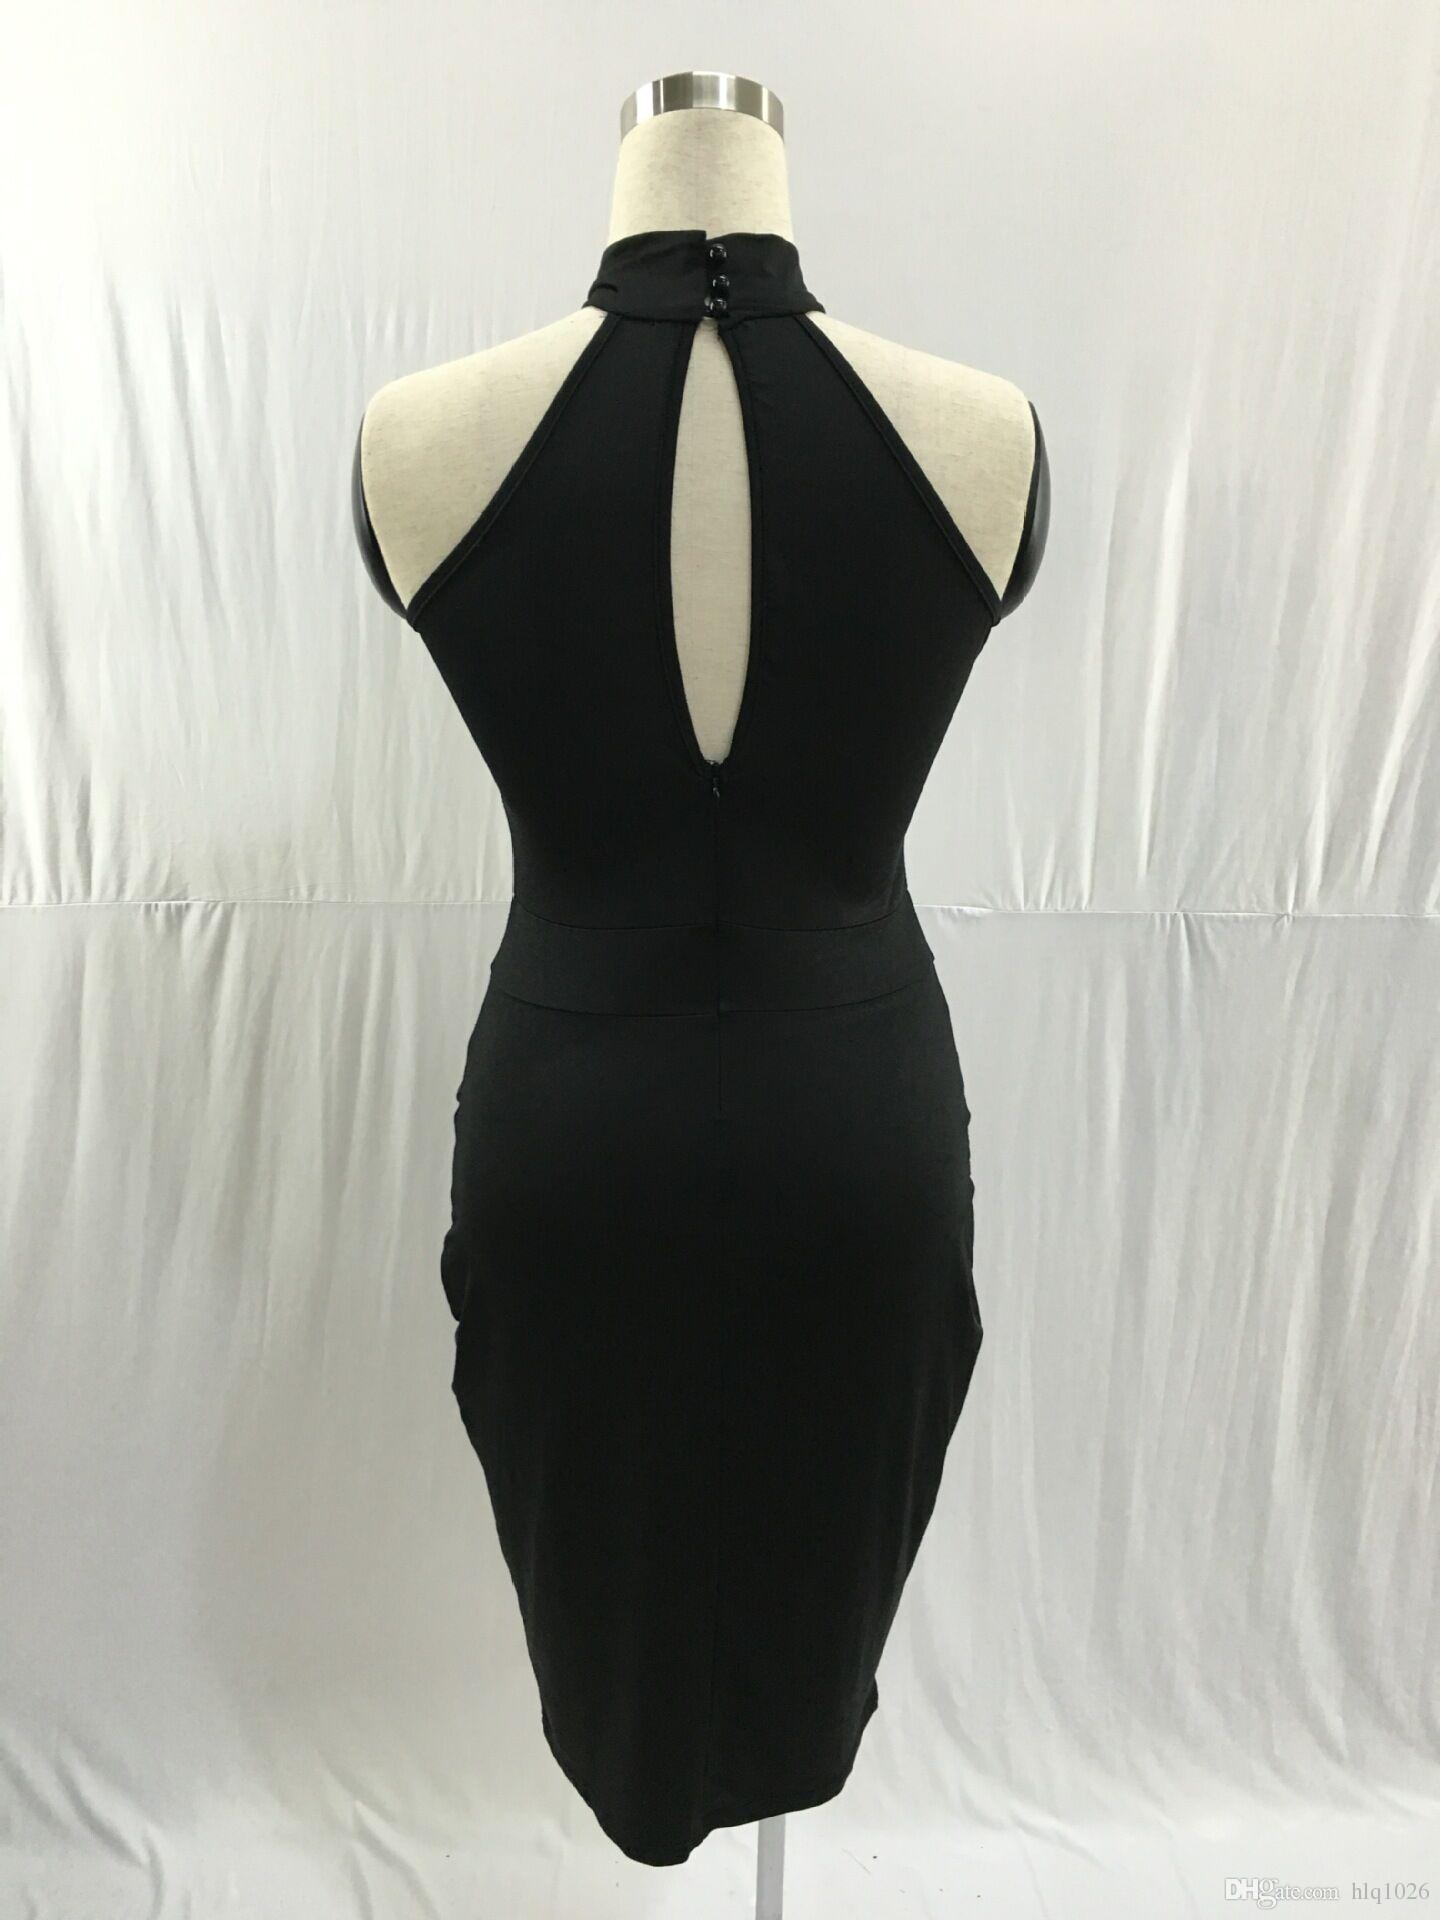 2017 Summer Sleeveless Midi Bodycon Dress Backless Sexy Women Dress Club Wear Elegant Mesh Party Dresses